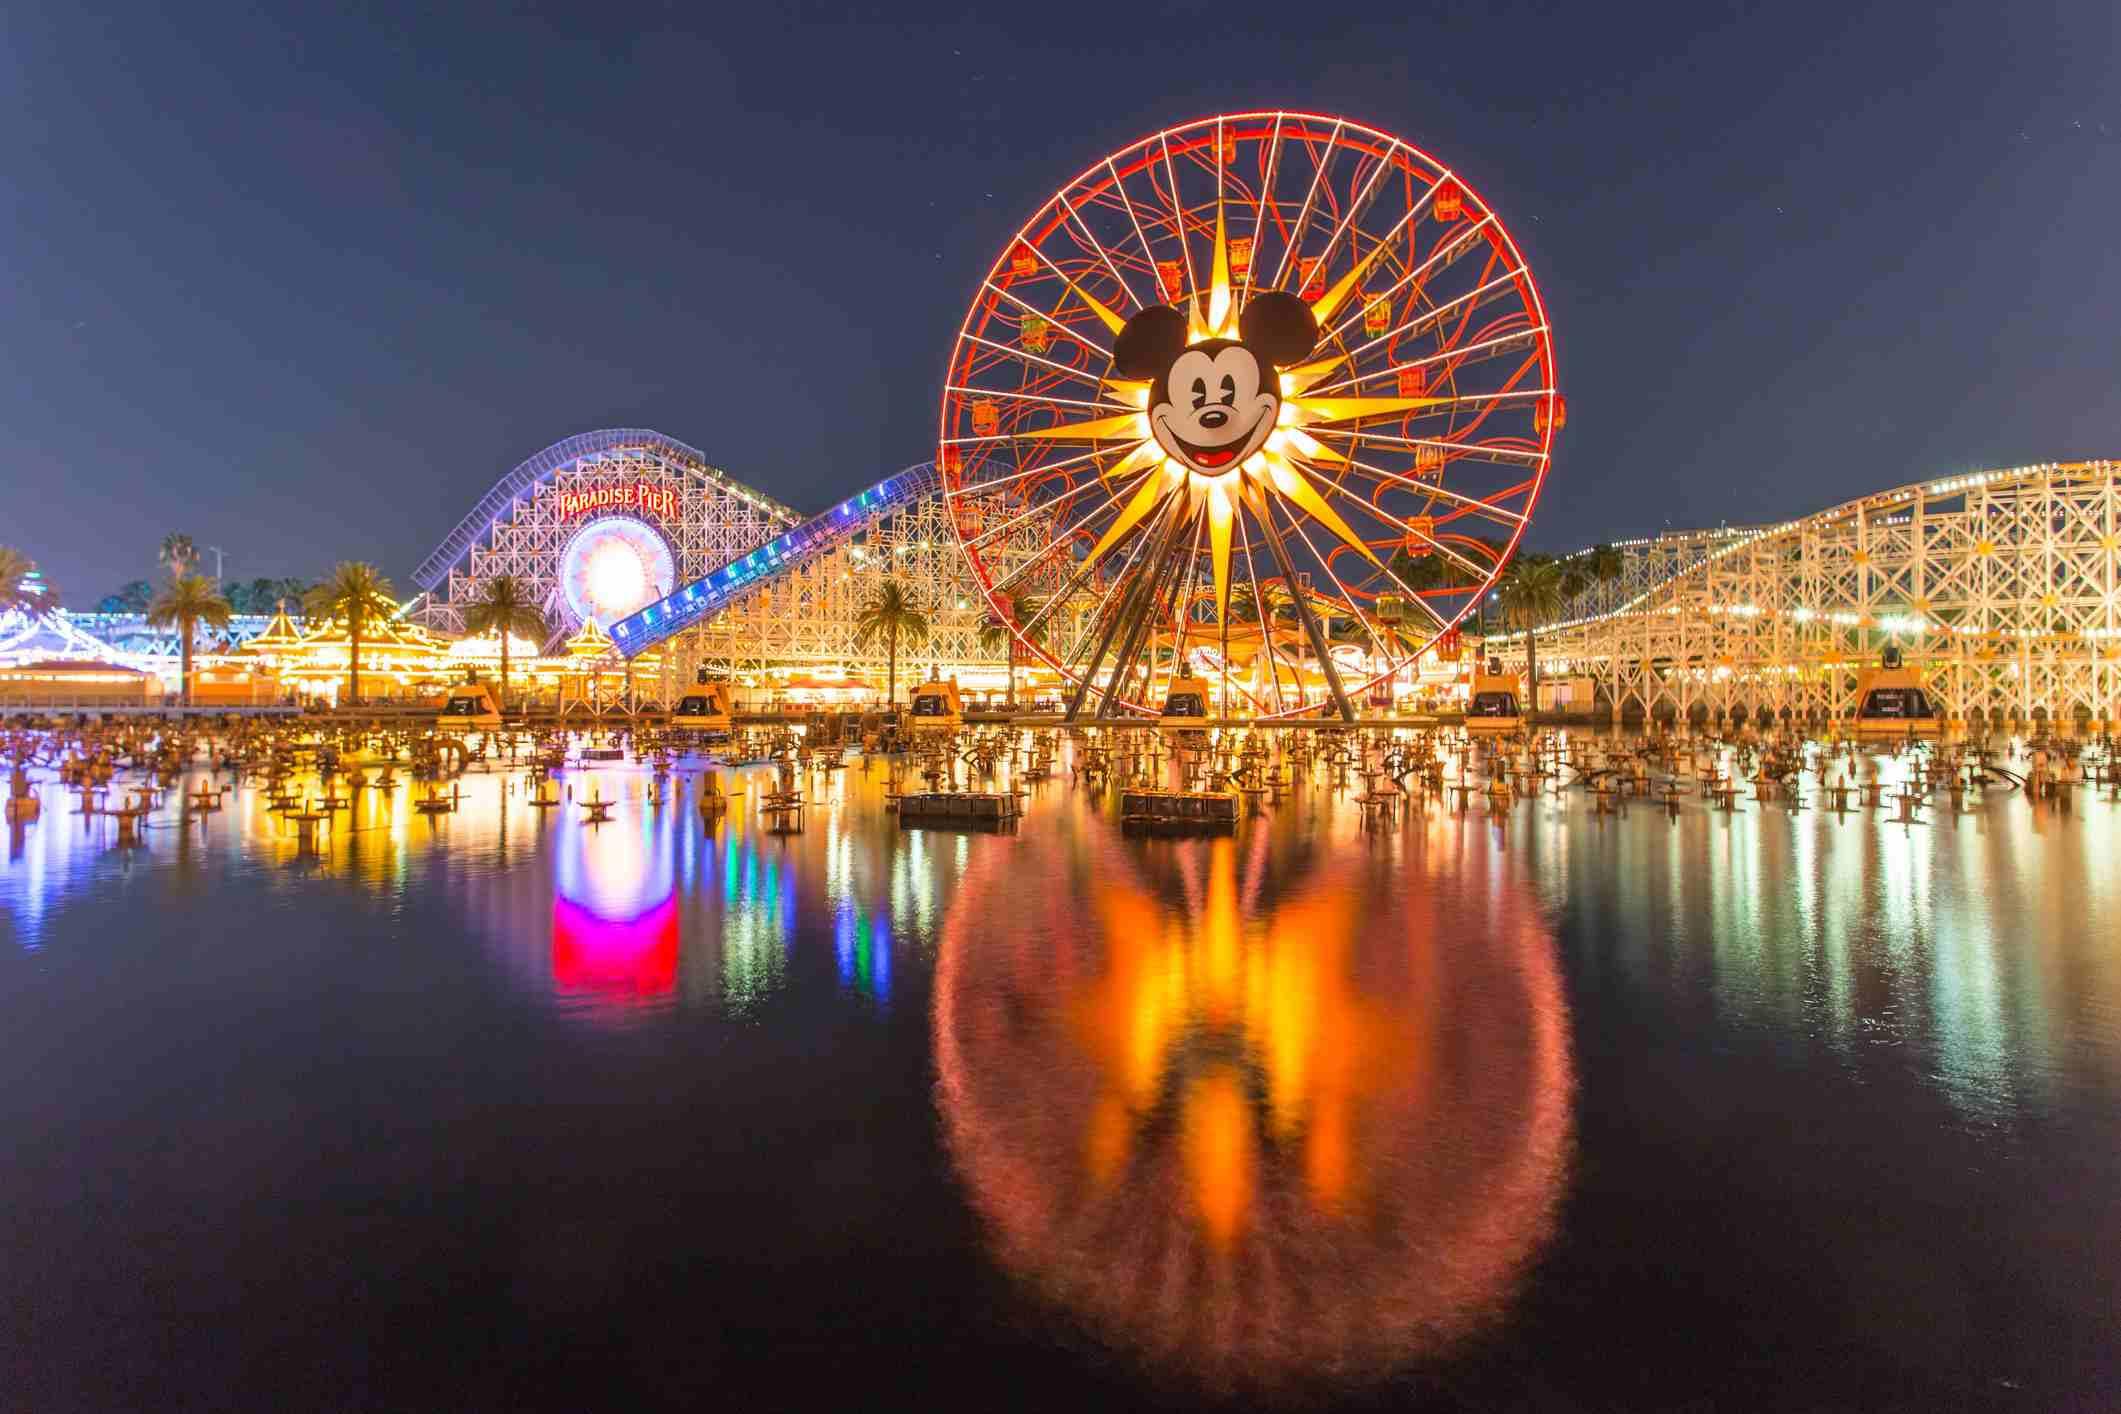 Disneyland 60th aniversary at Cars Land night time